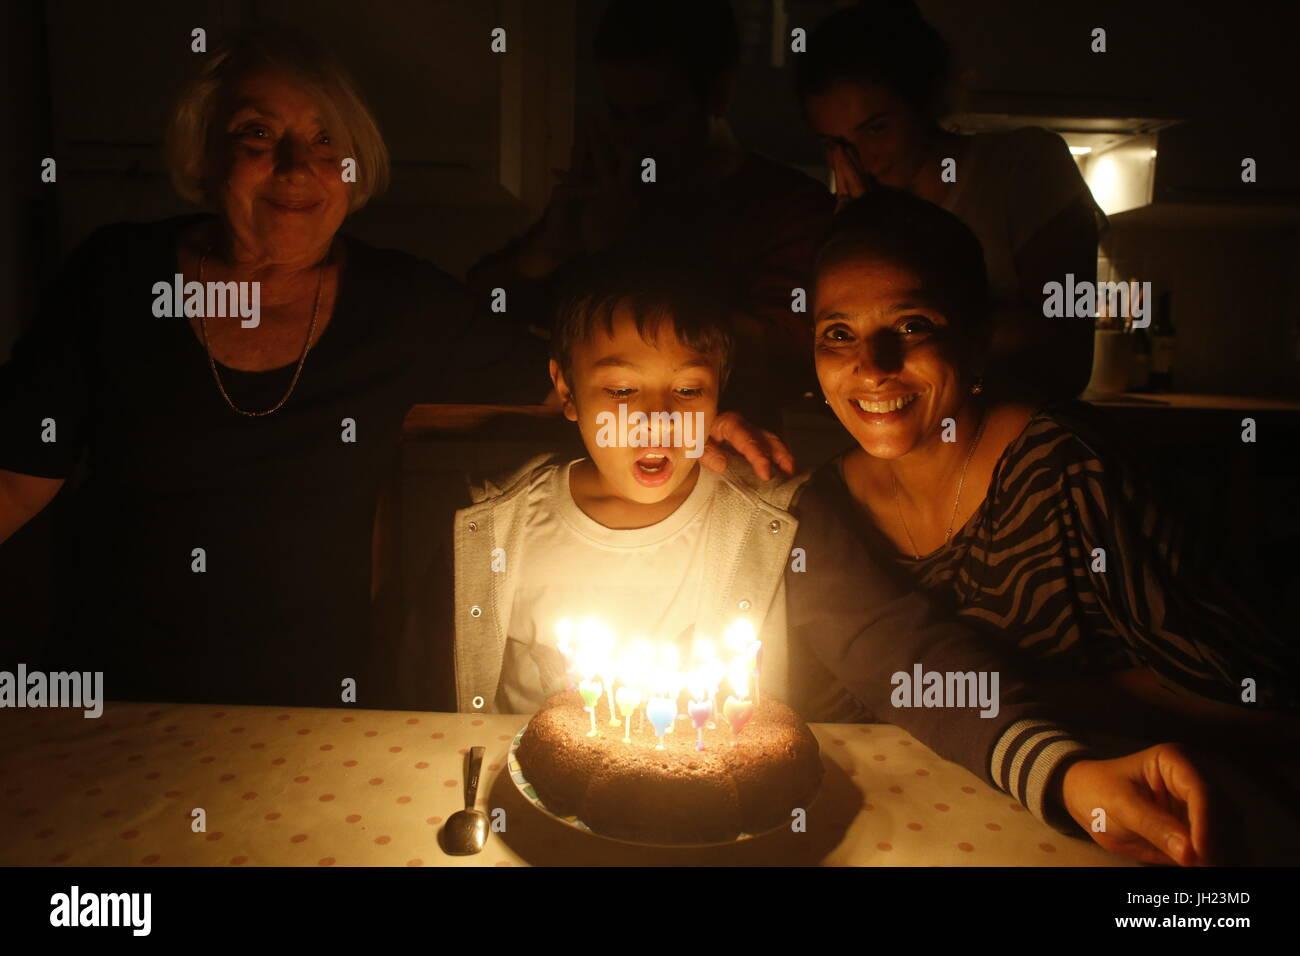 11 Year Old Birthday Cake Stock Photos & 11 Year Old